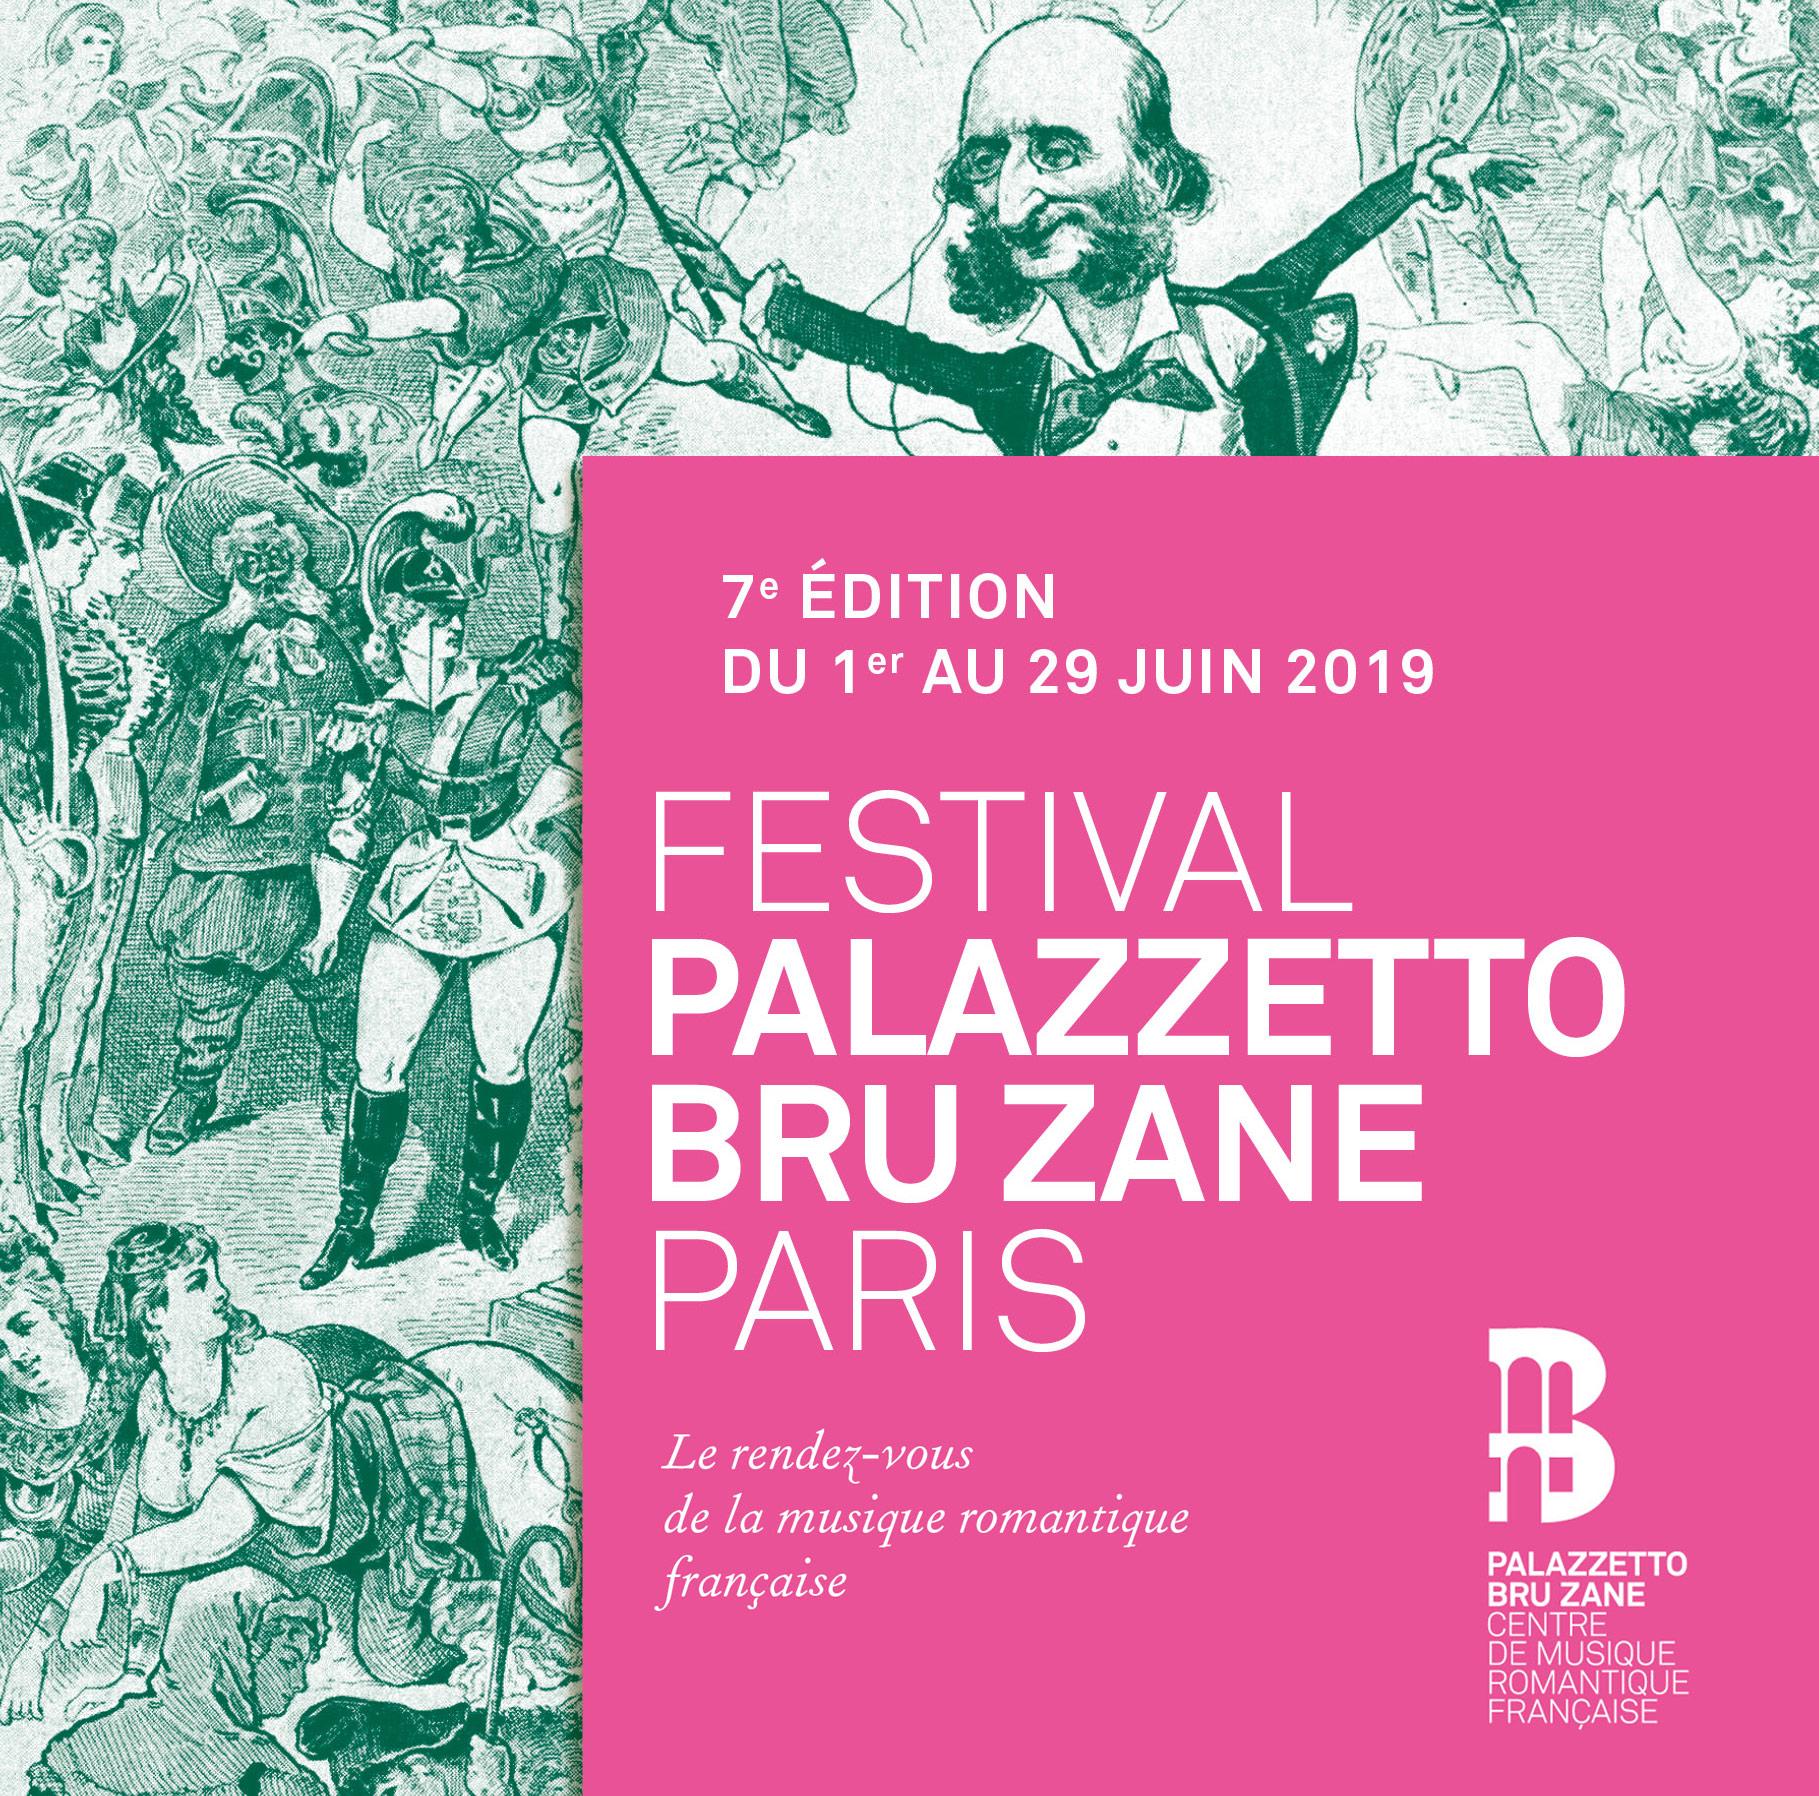 Festival-Palazzetto-Bru-Zane-Paris-2019